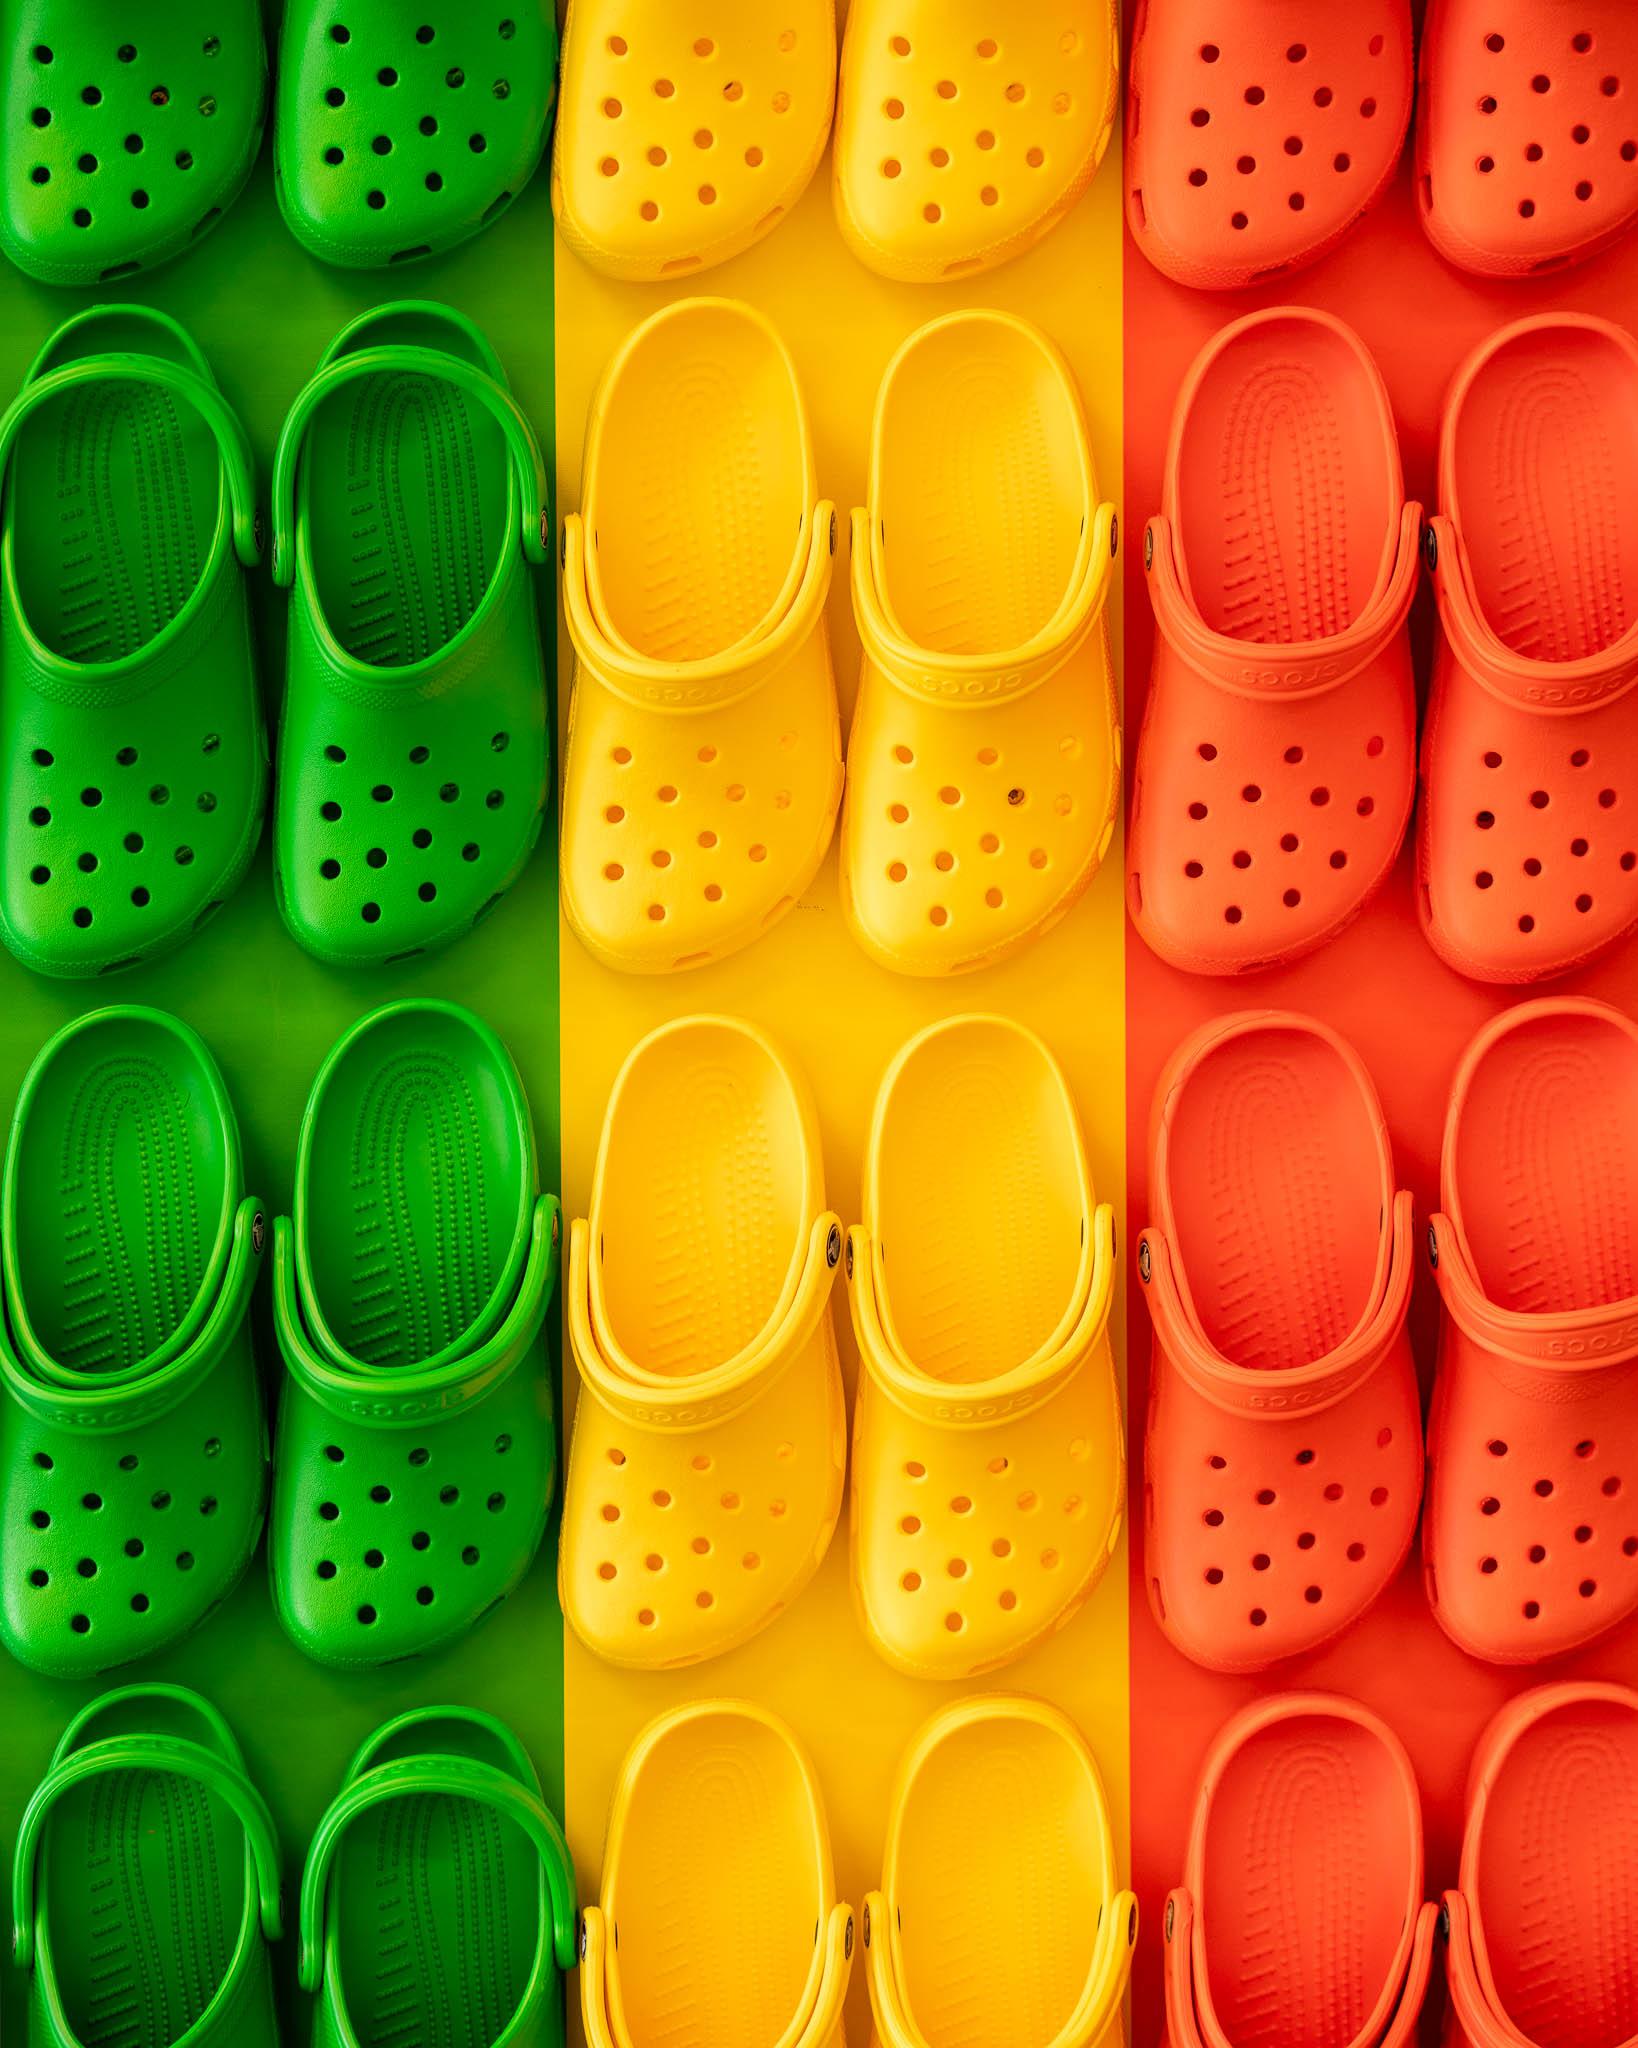 Crocs Proofs-20.jpg